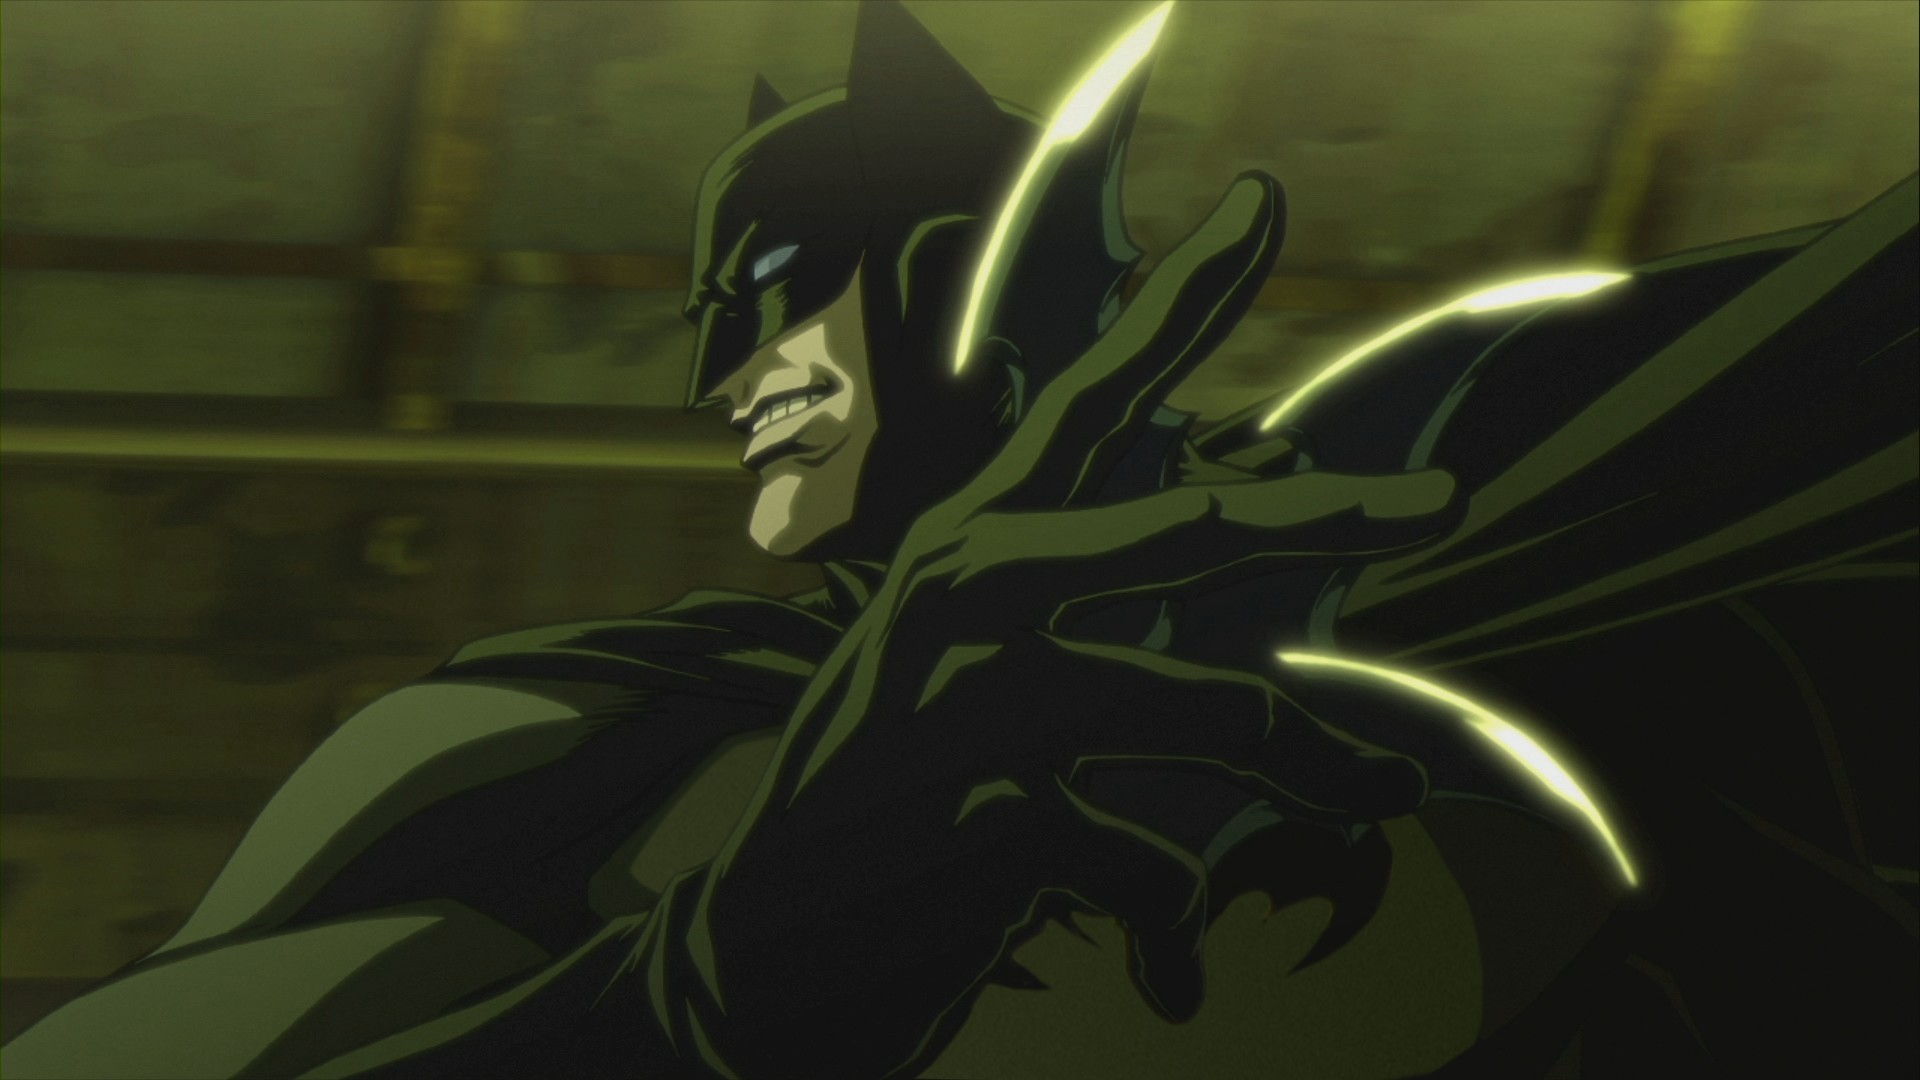 Batman Gotham Knight Wallpaper 183 ① Wallpapertag